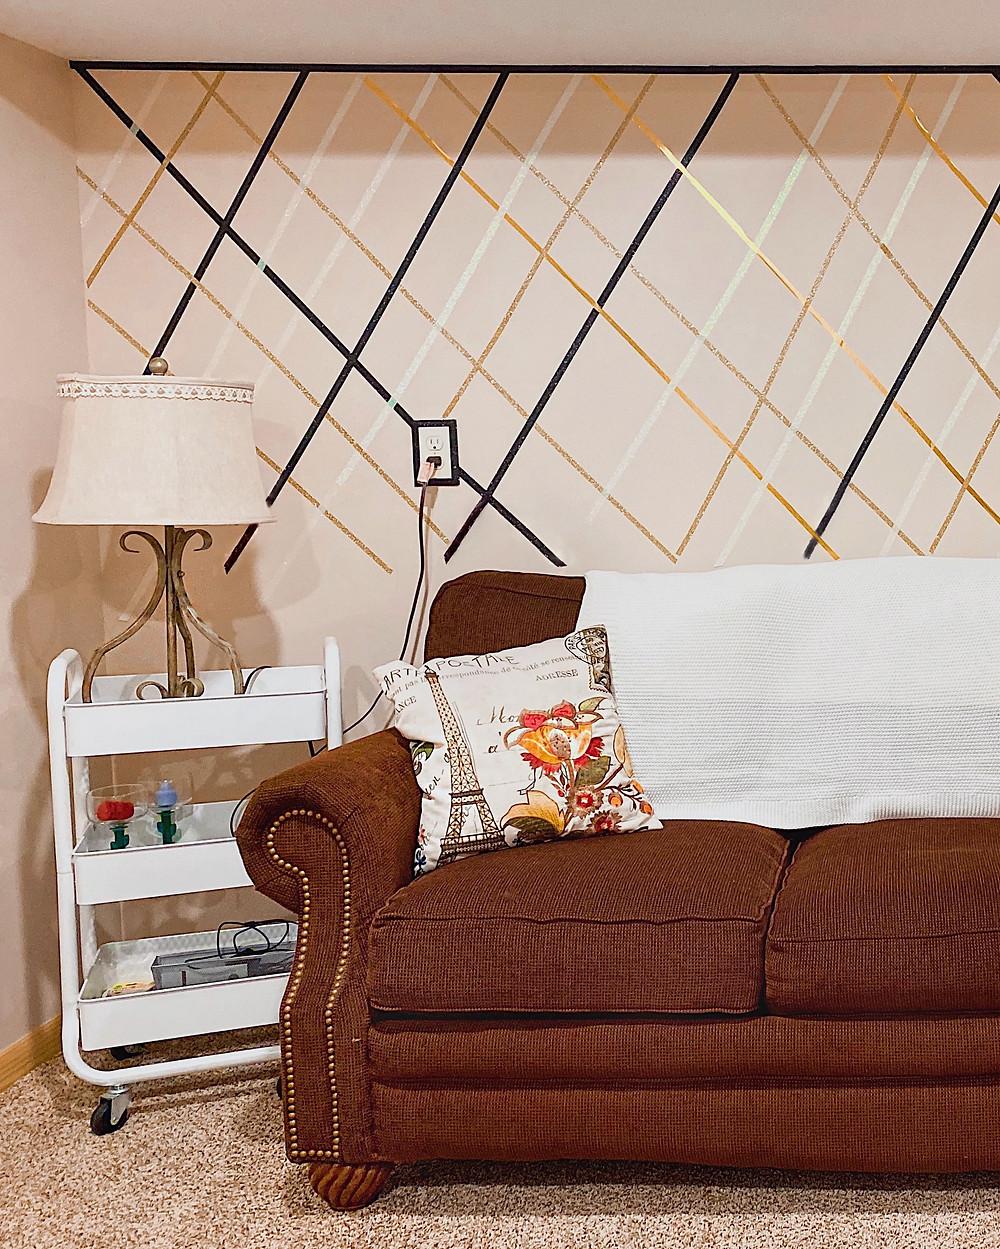 Diy wall renovation, home, interior design